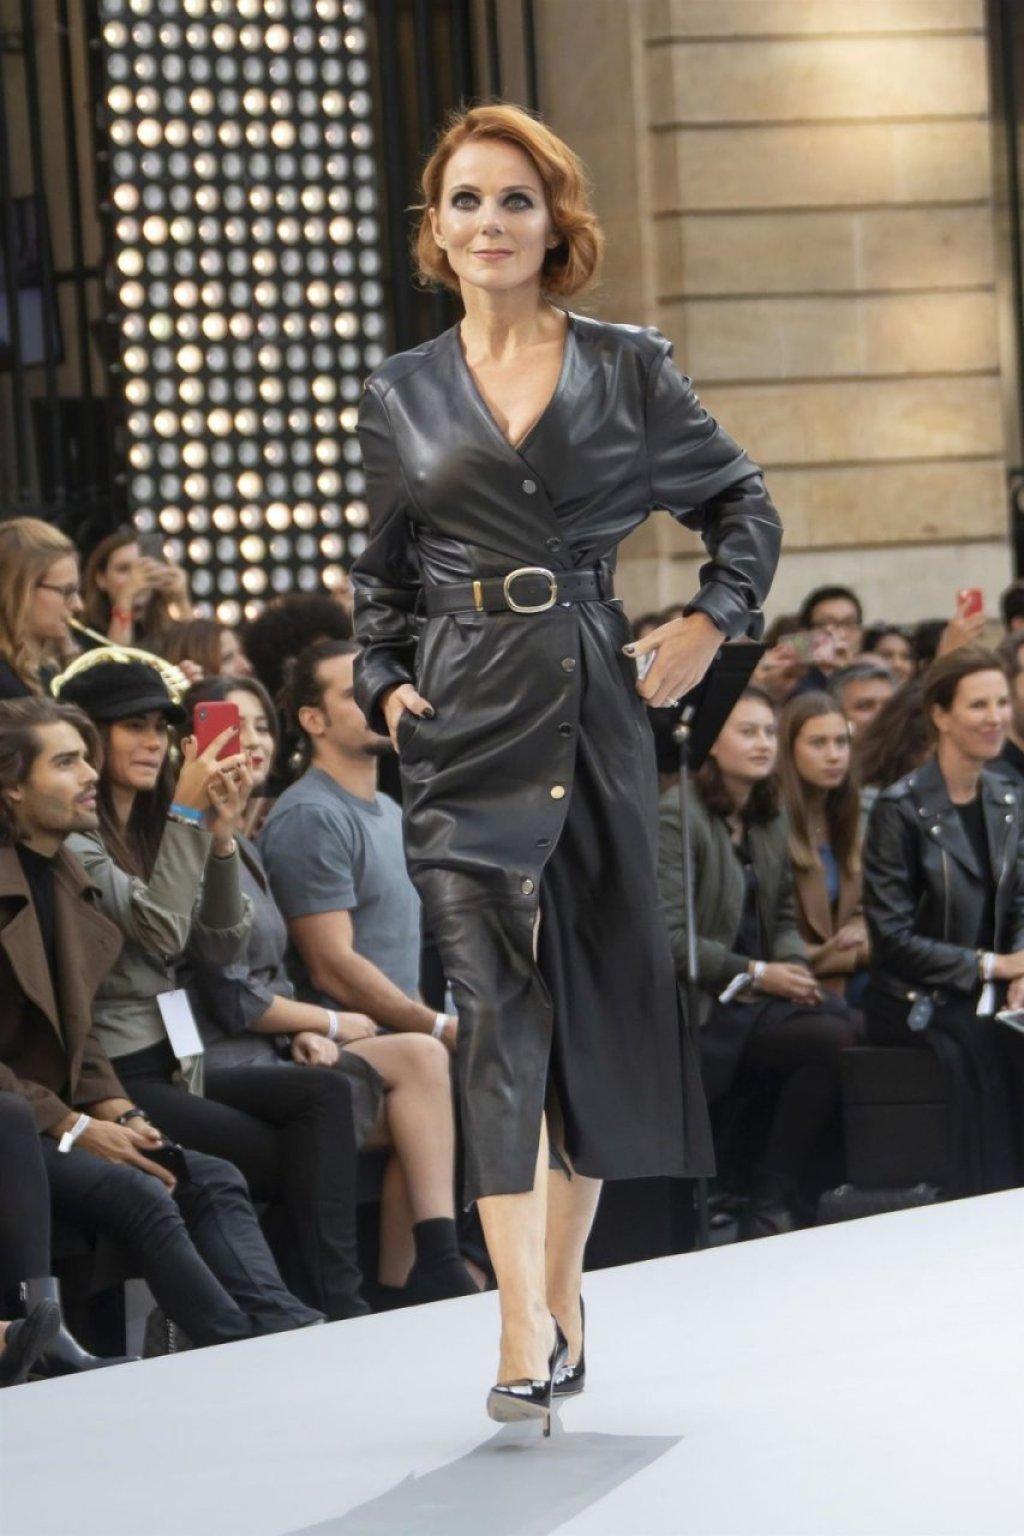 Geri Halliwell Sexy (13 Photos)